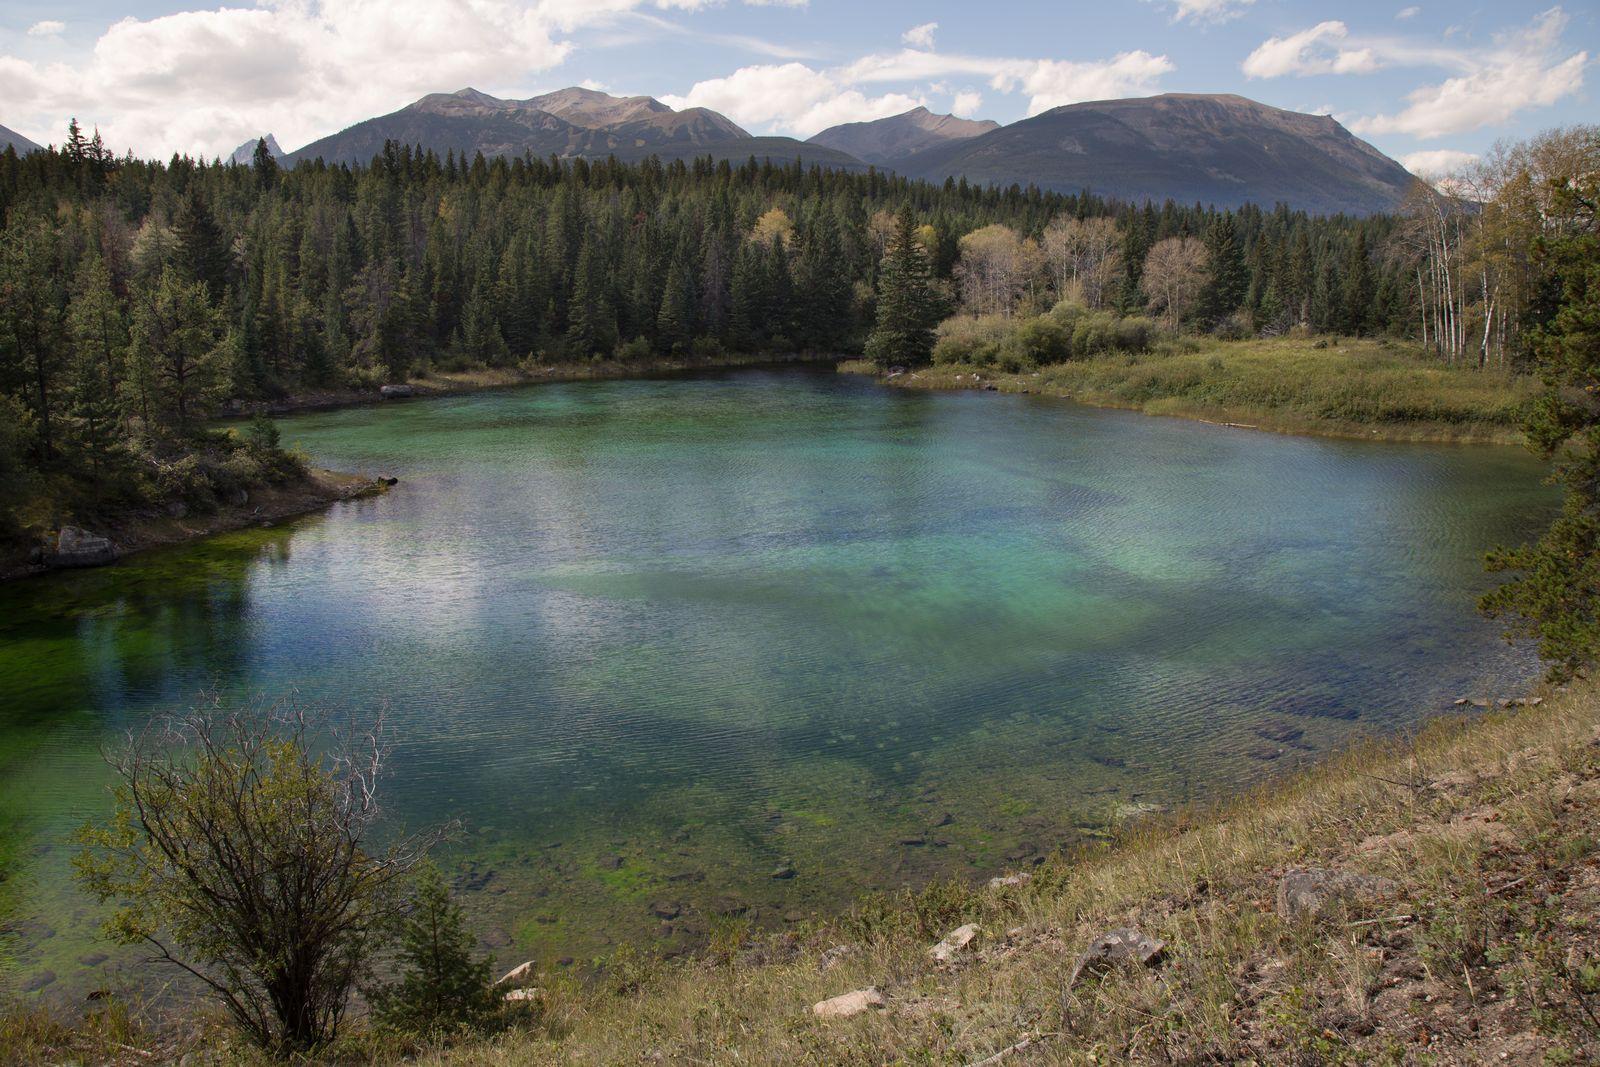 El tercer lago